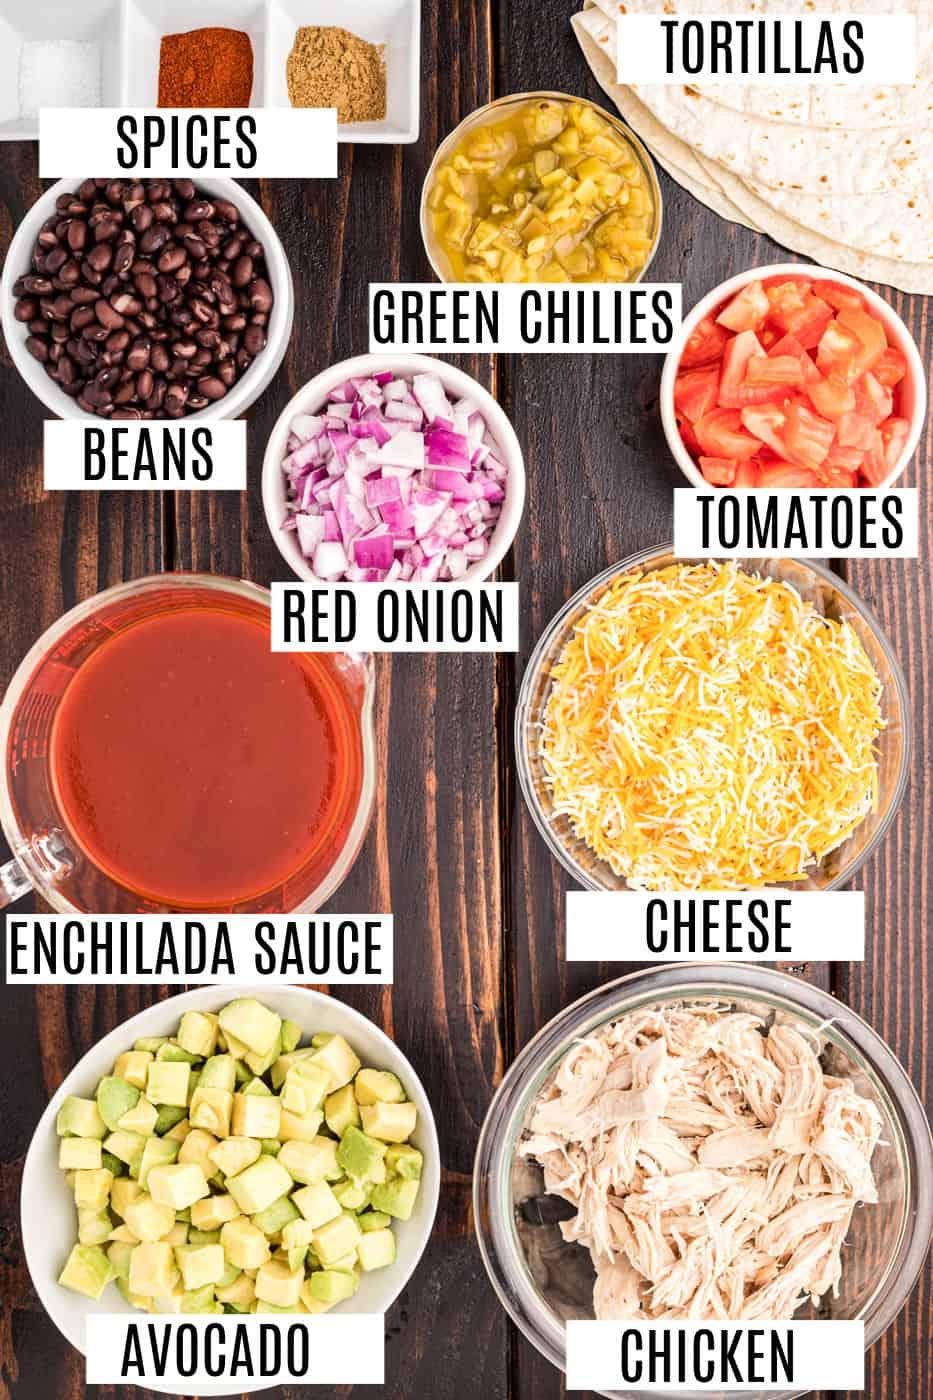 Ingredients needed for chicken avocado enchiladas.